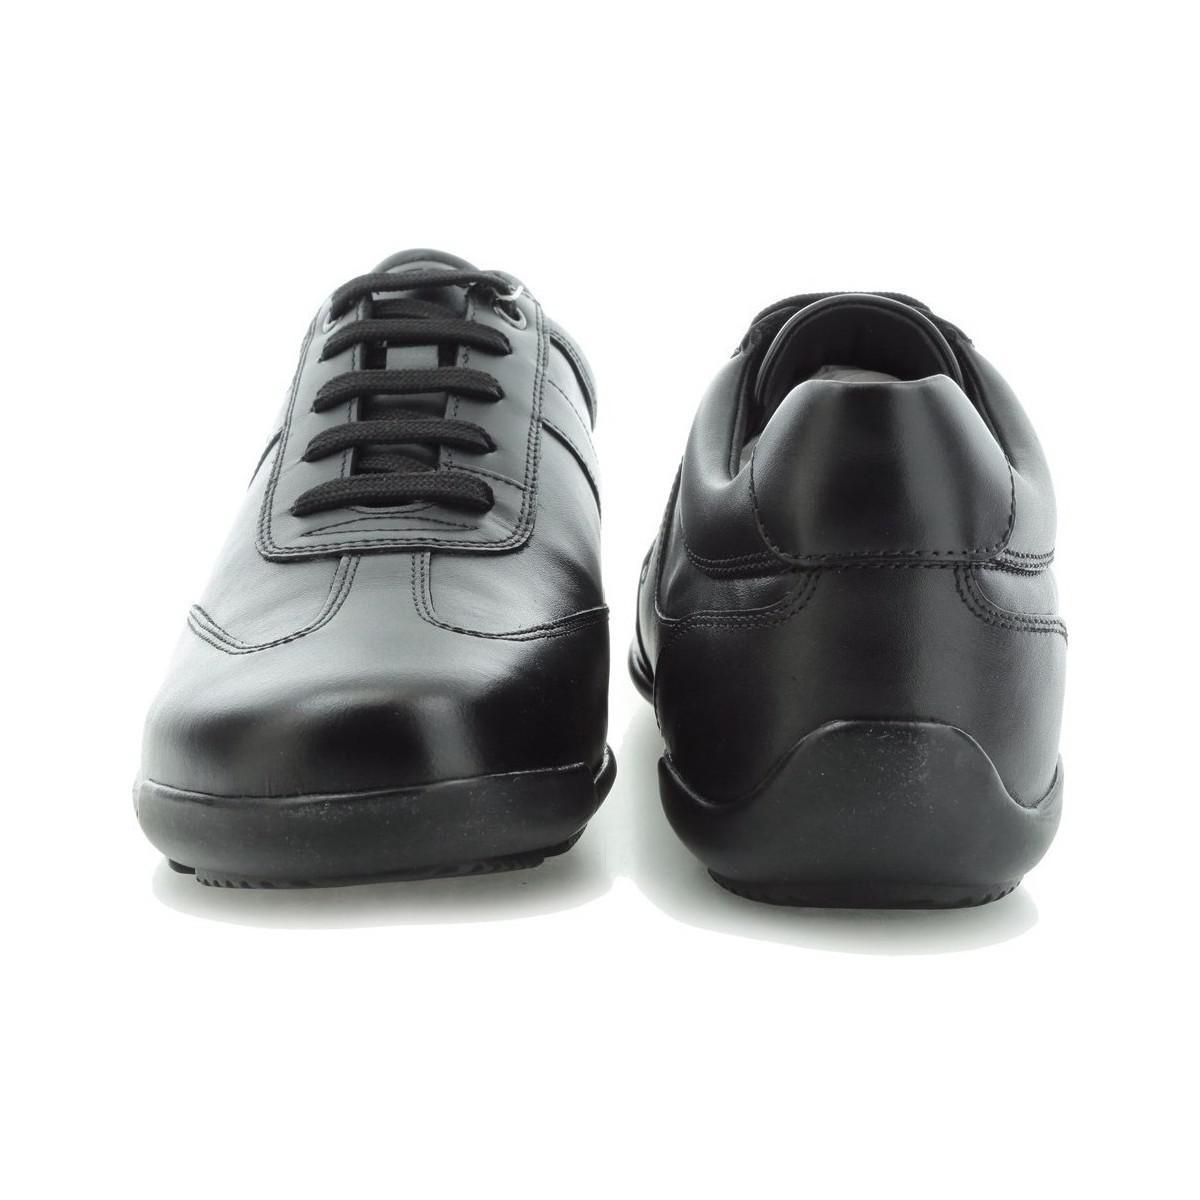 Geox Pół Edgware U743bb 043bc C9999 Men's Shoes (trainers) In Multicolour in Black for Men